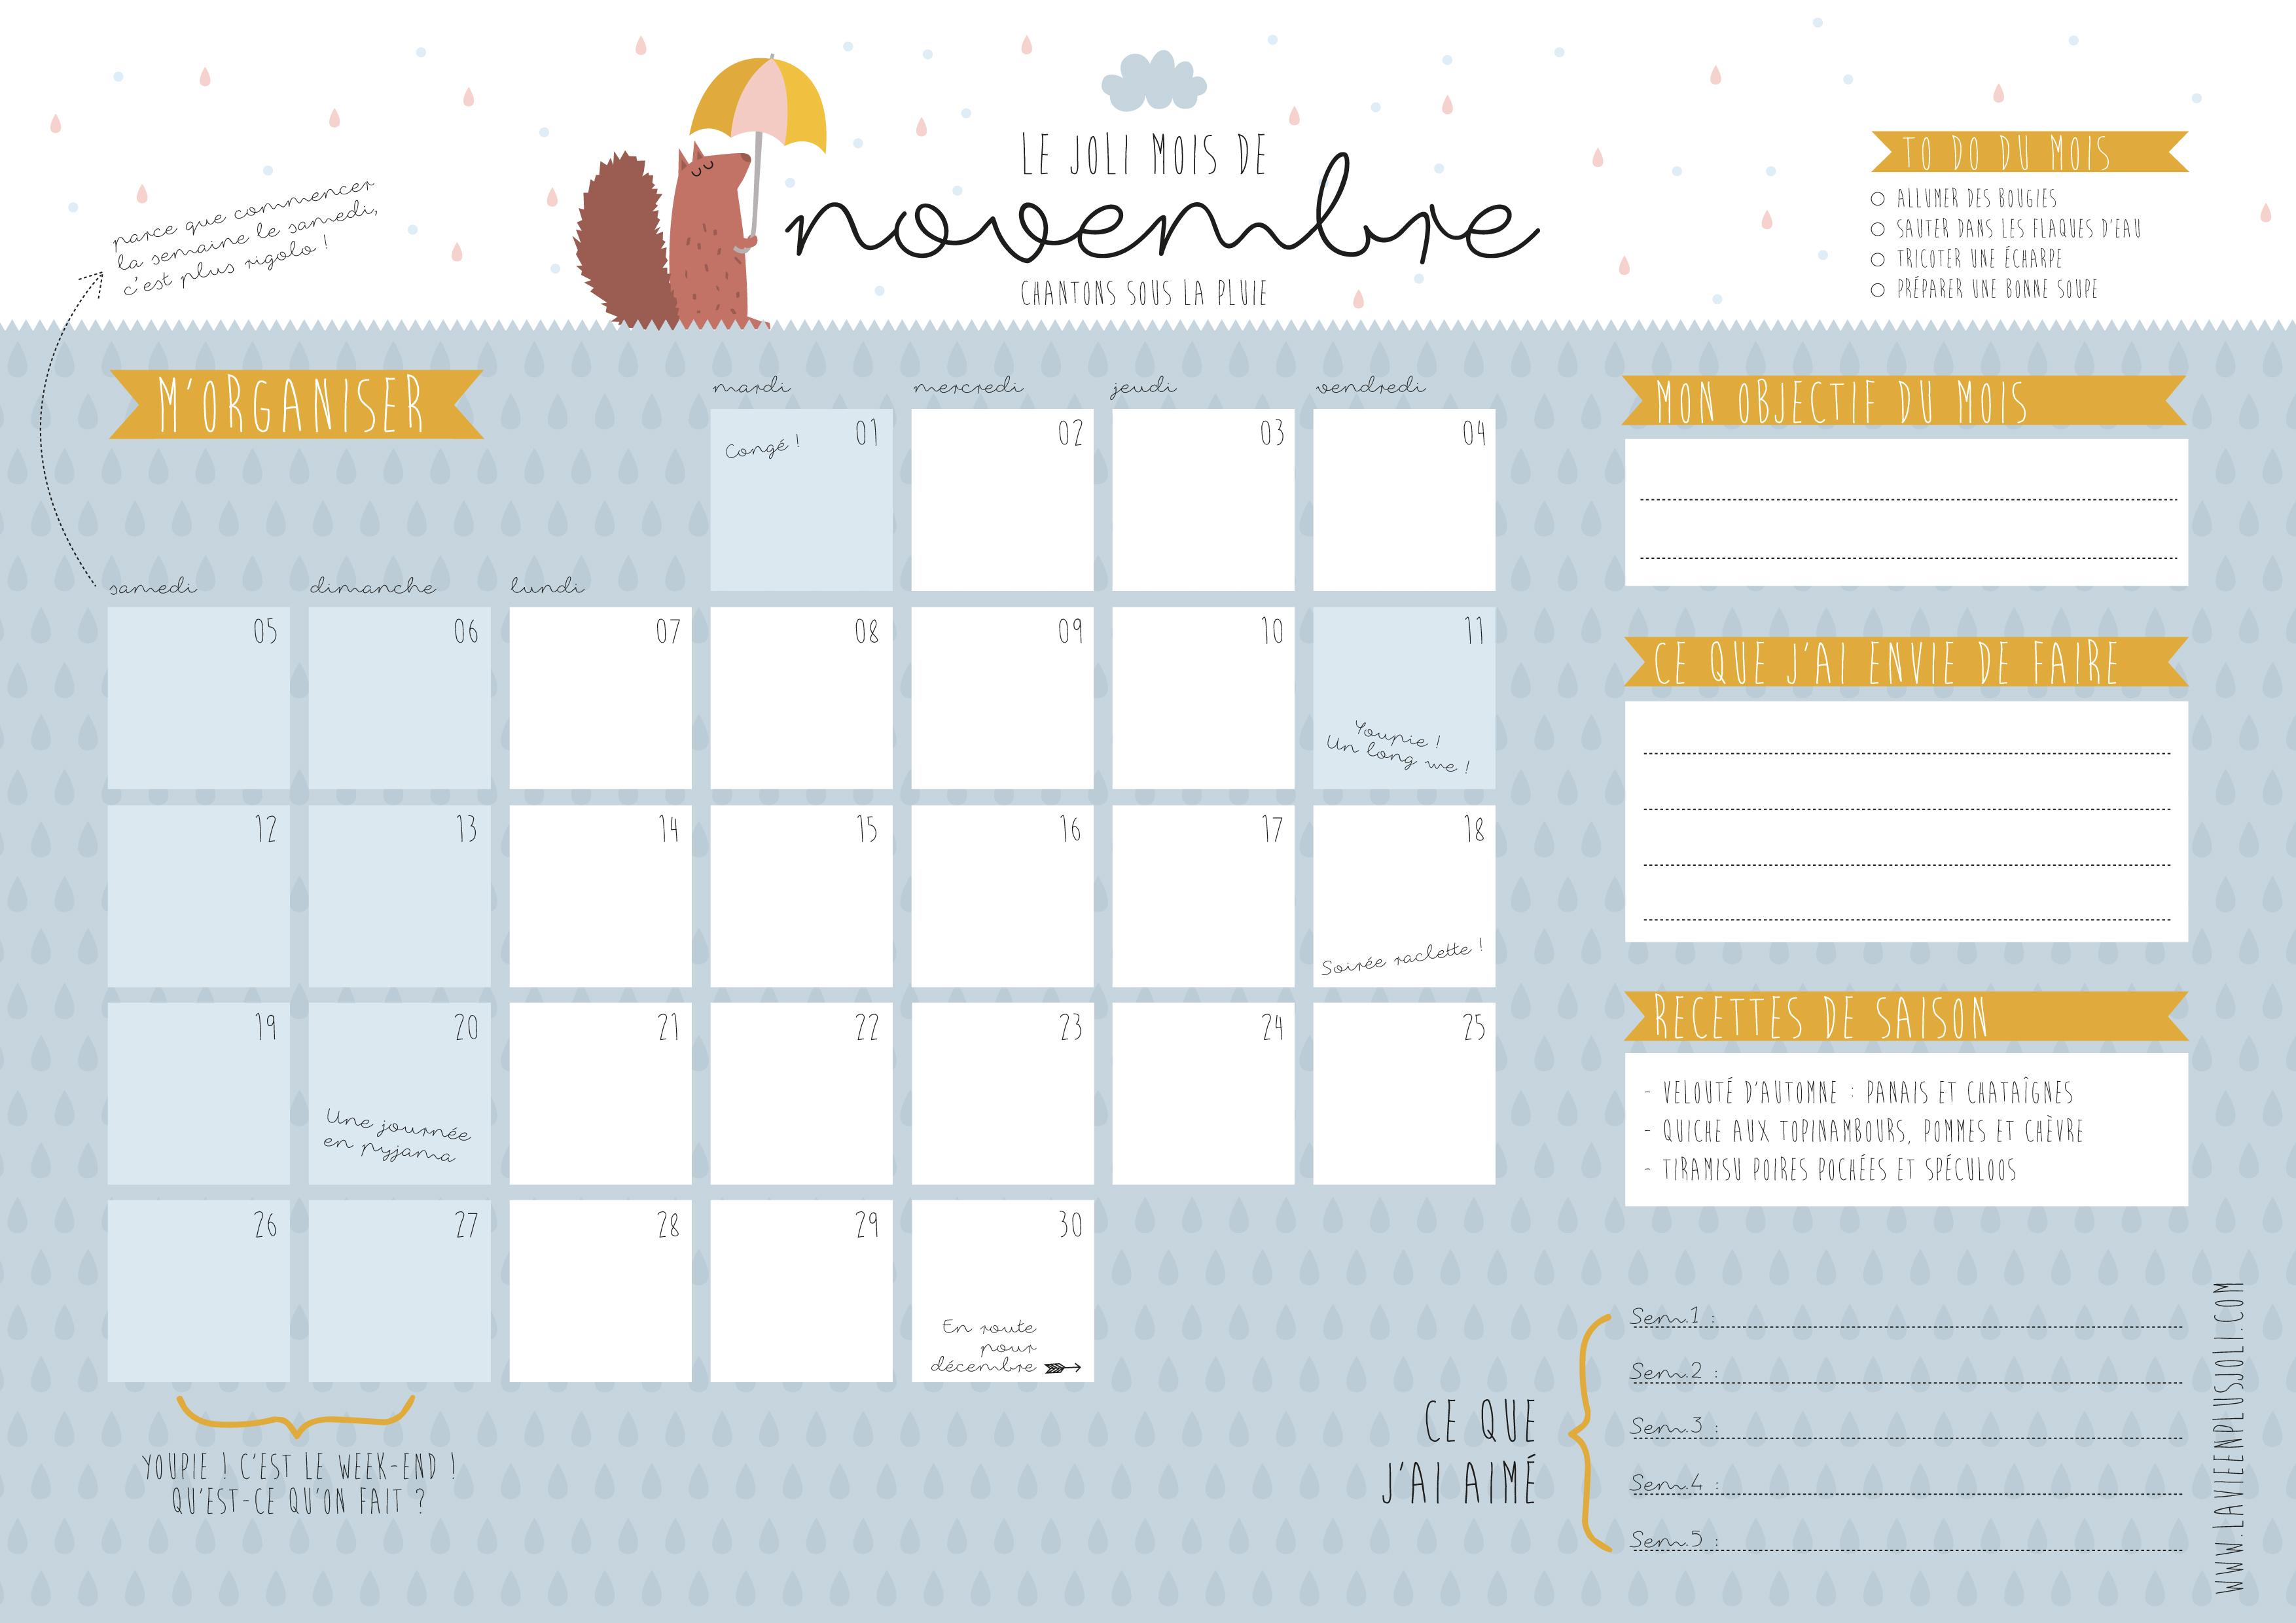 Calendrier A Imprimer Novembre 2019.Calendrier Du Mois De Novembre A Imprimer La Vie En Plus Joli